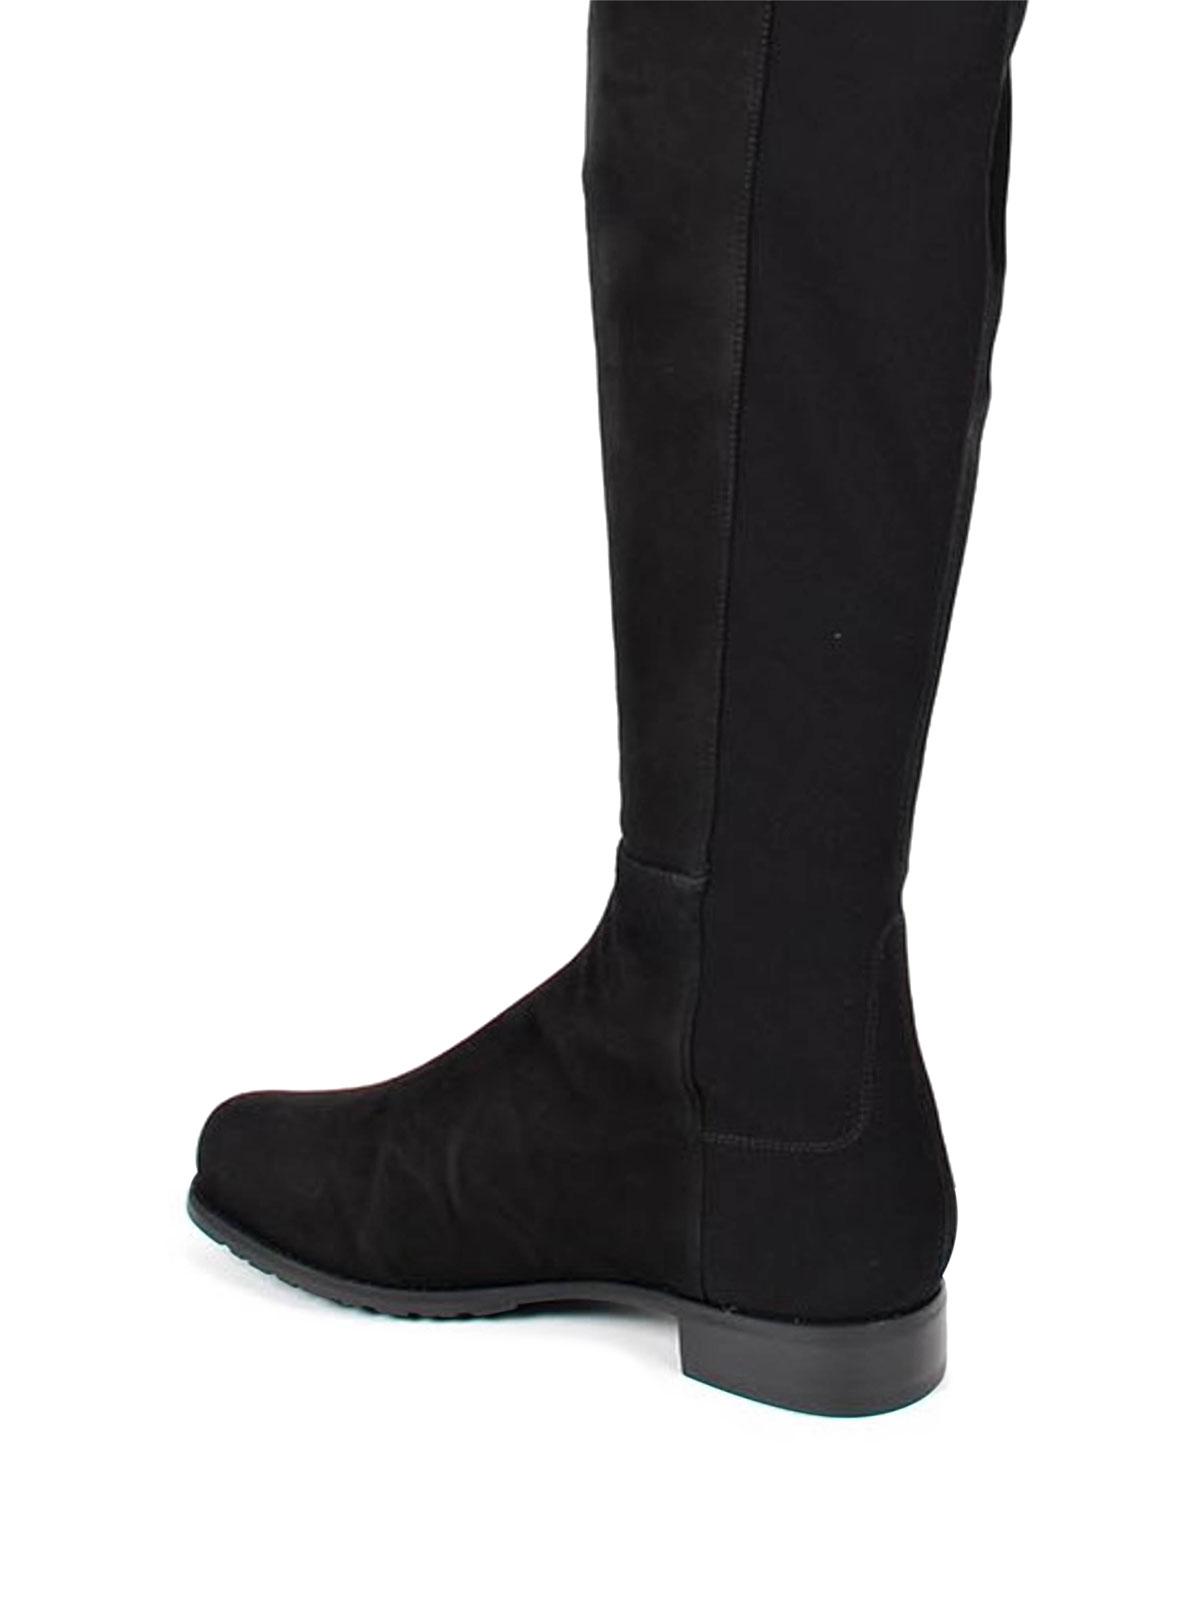 ba37982959e Stuart Weitzman - The 5050 suede boot - boots - 5050 SUEDE